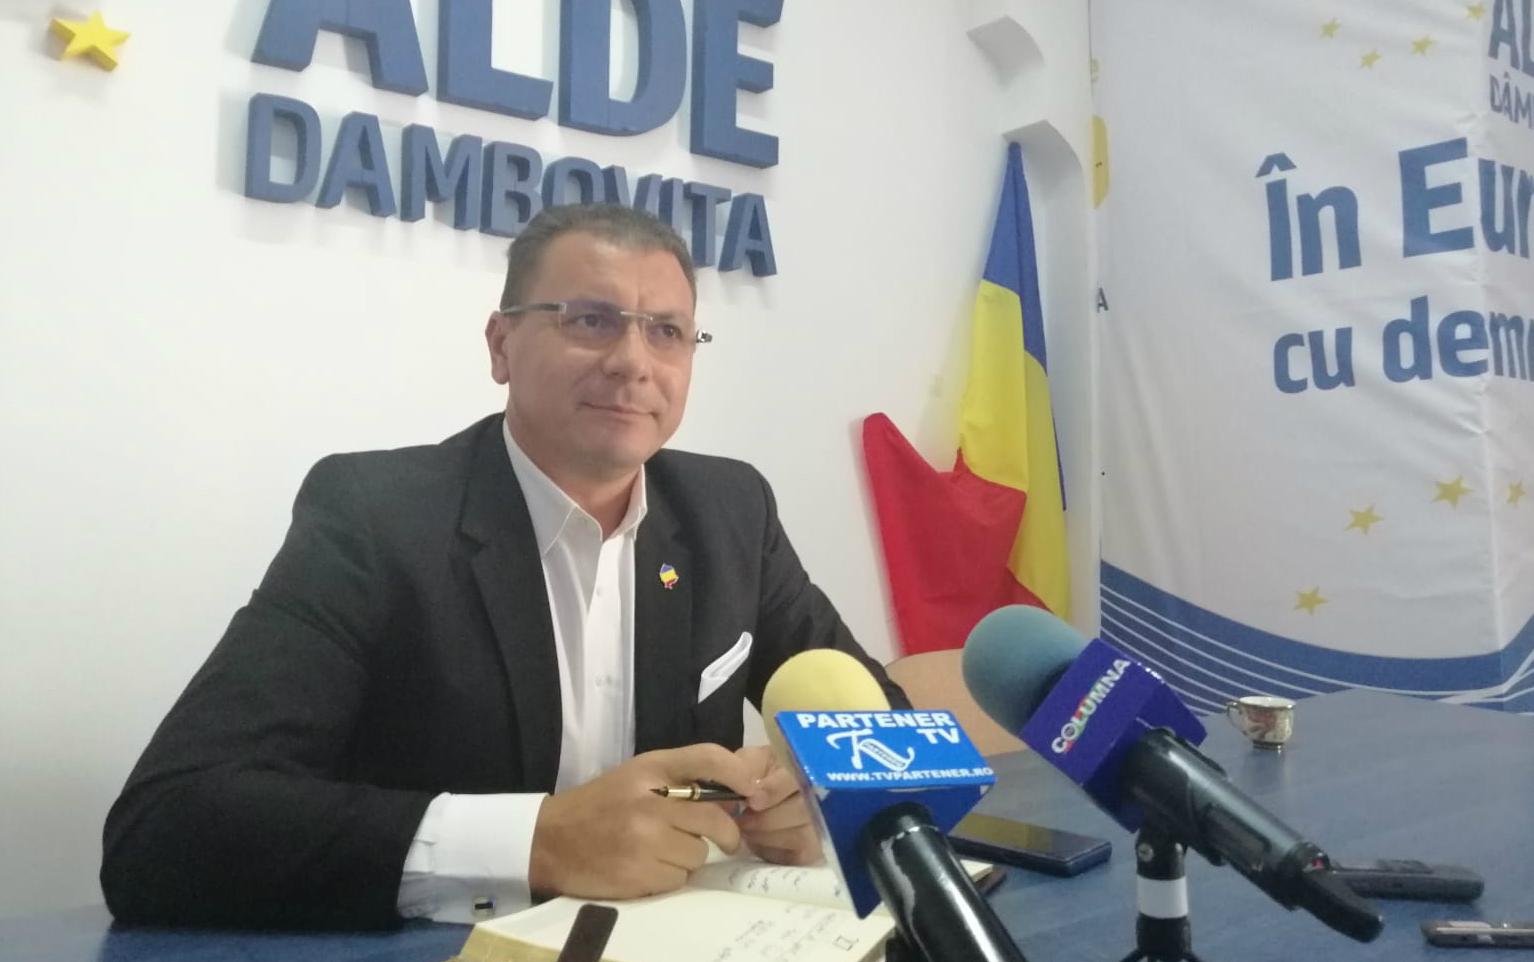 ALDE vrea un nou program de guvernare